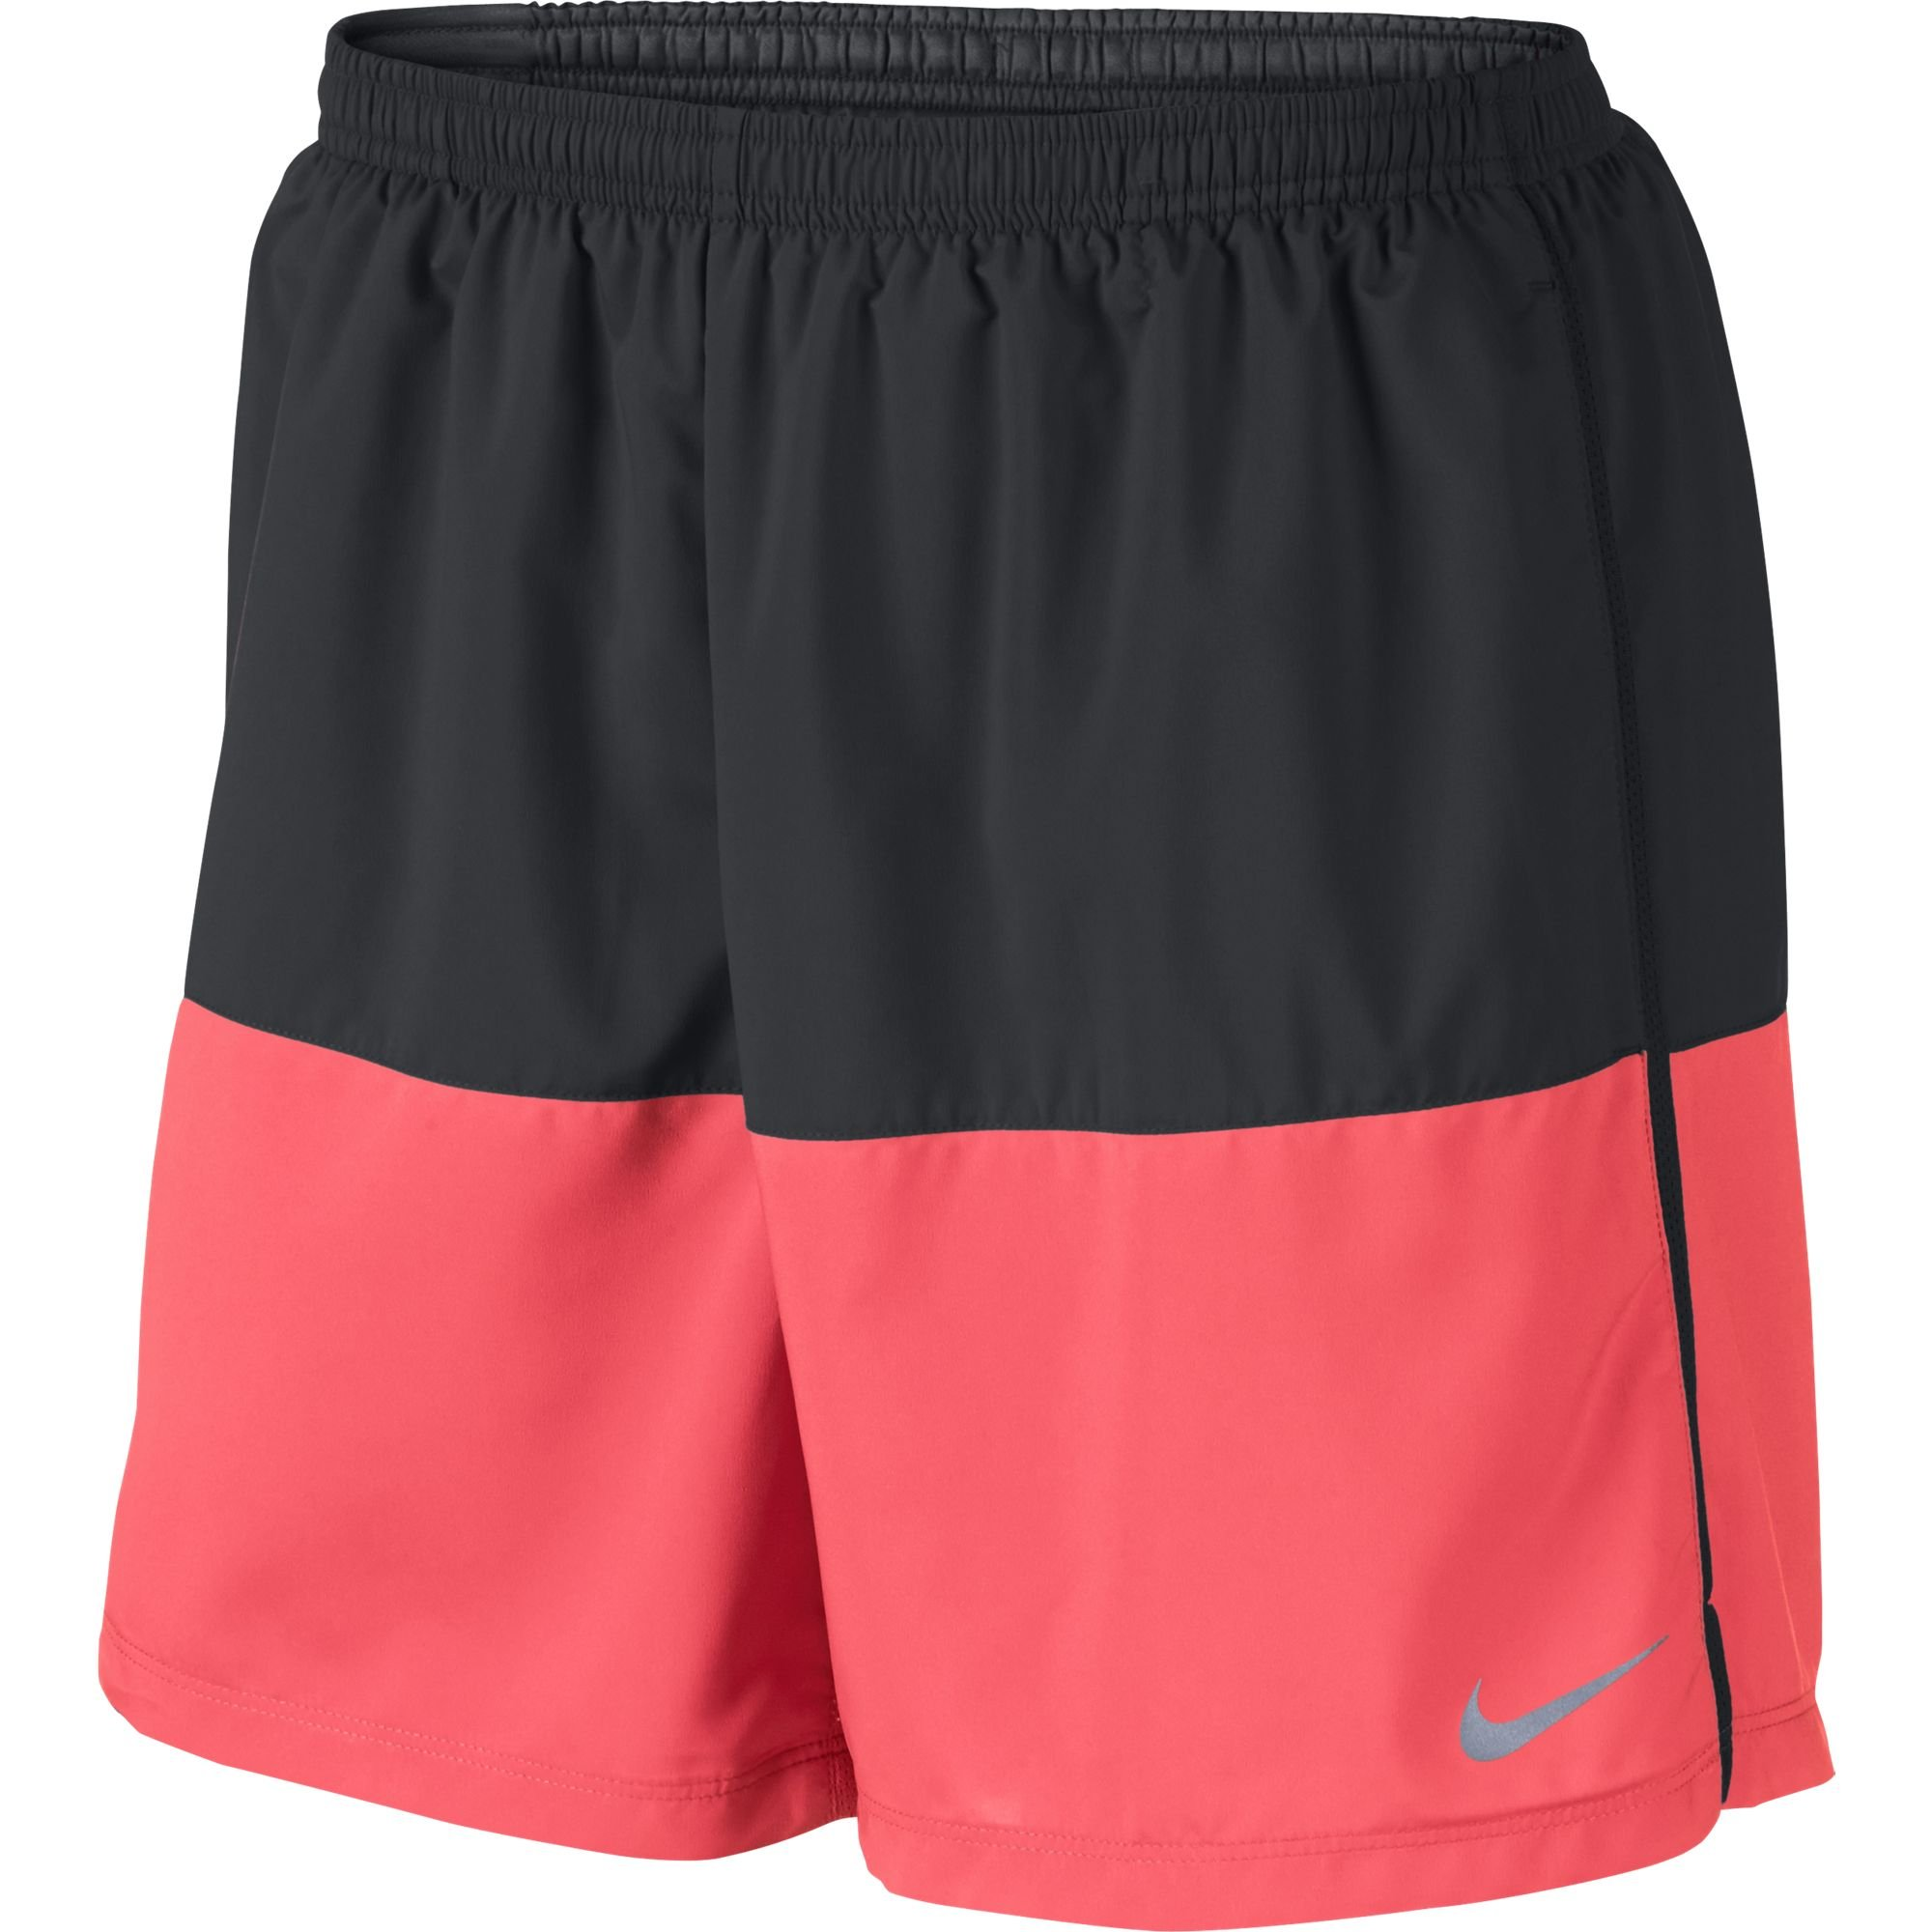 Nike Short Distance 12.7cm M v�tement running homme